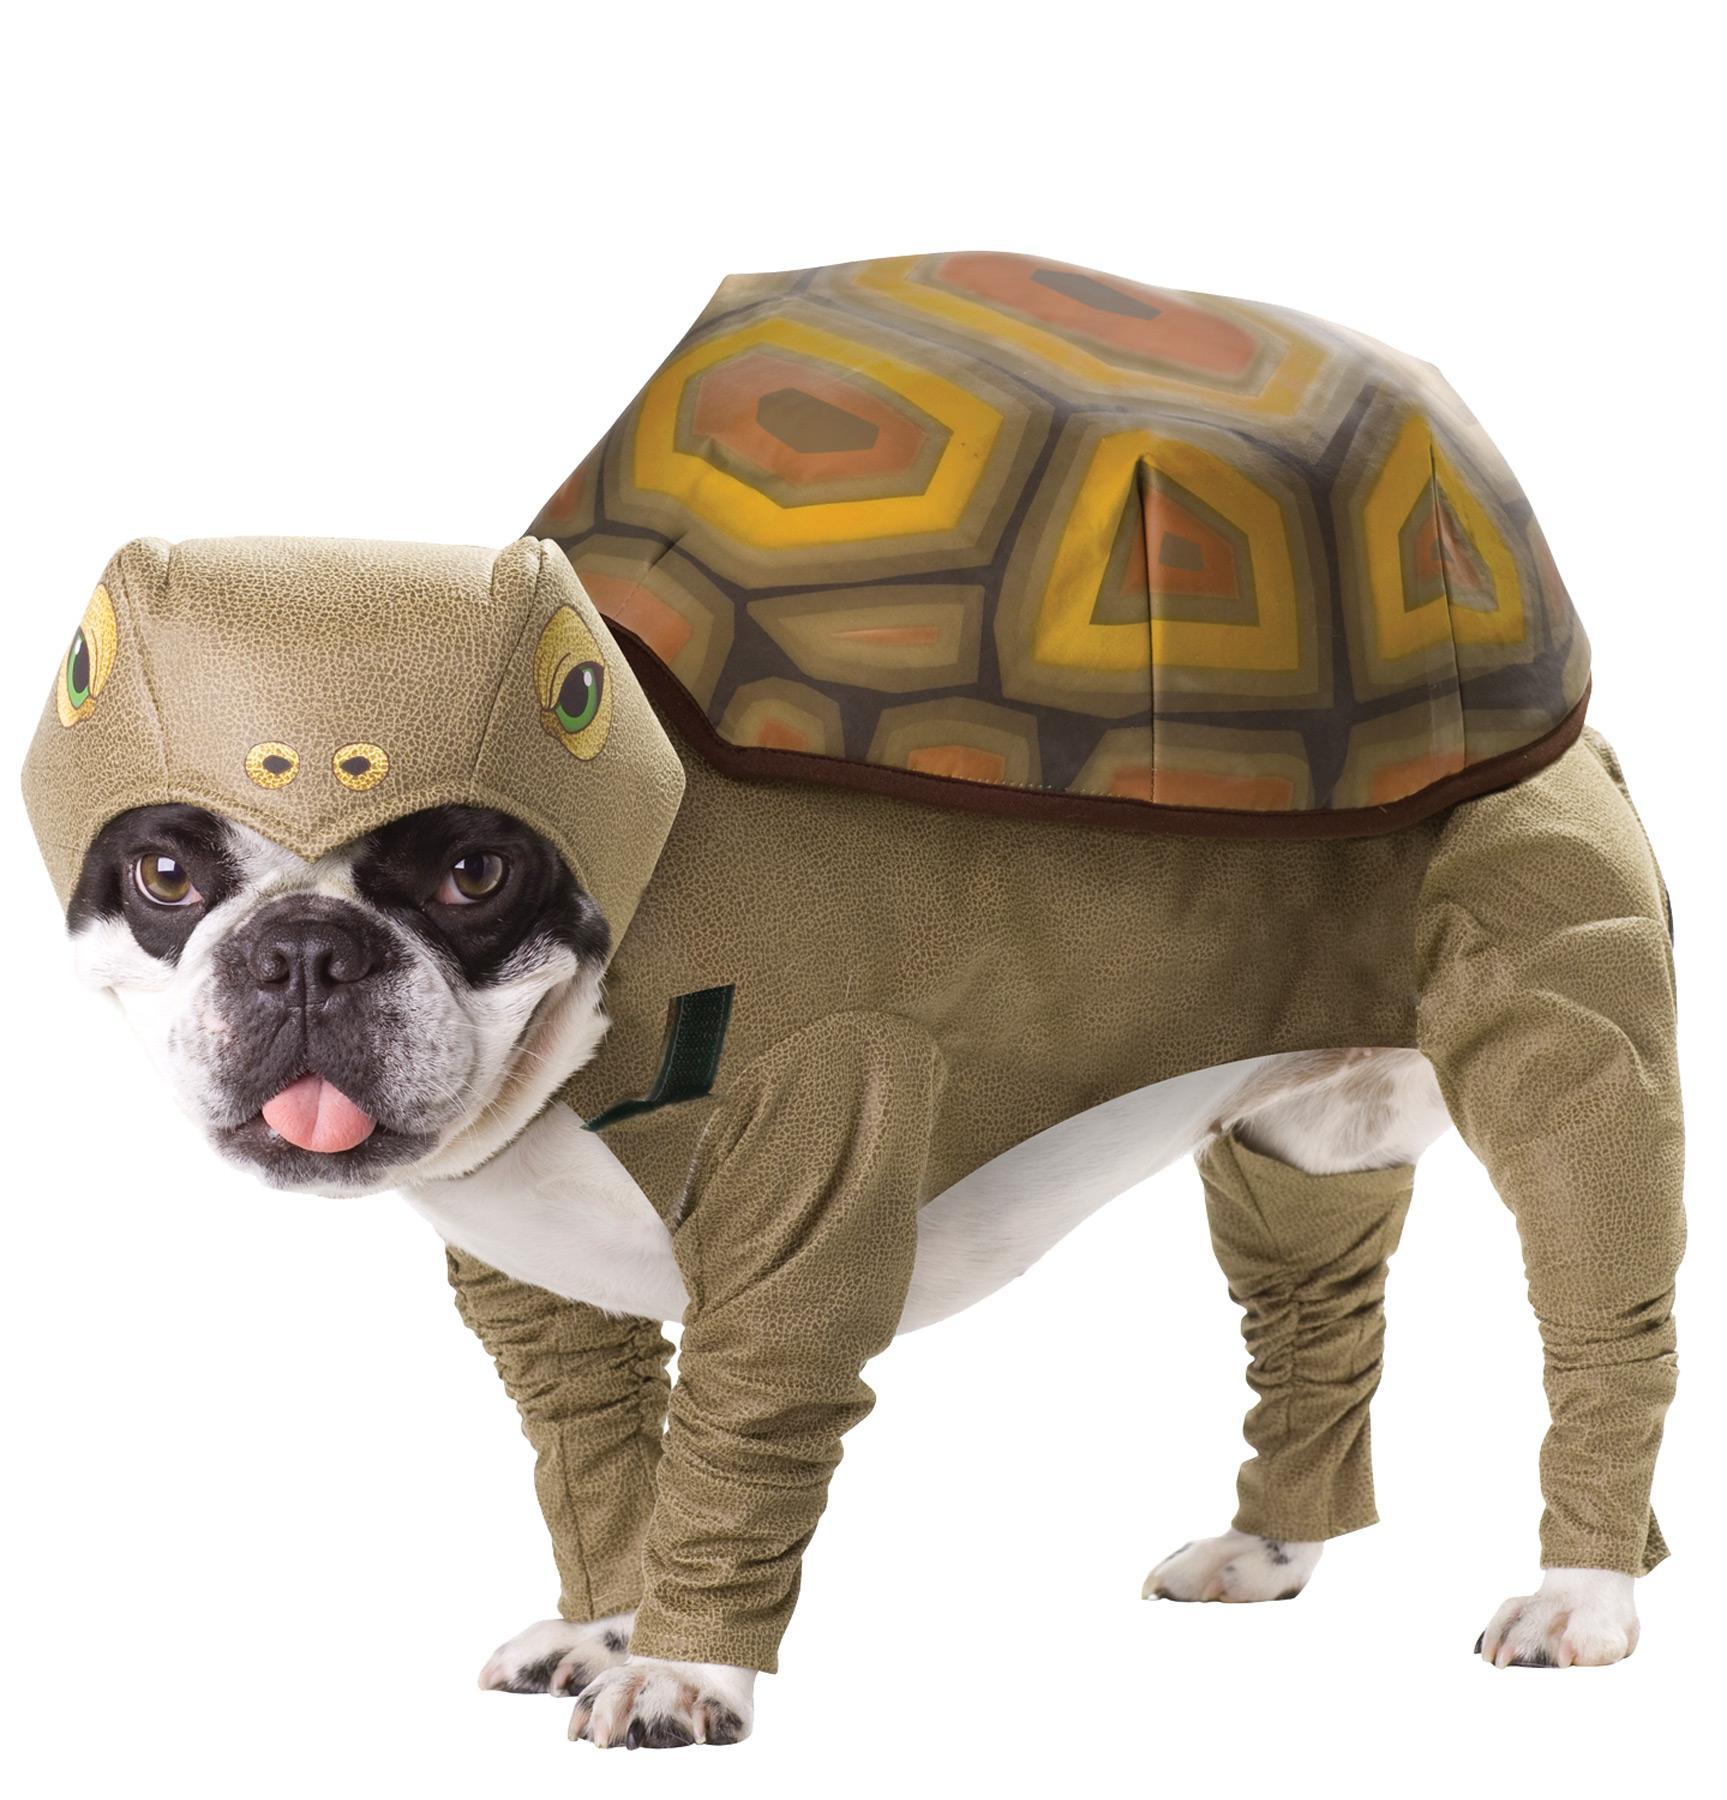 Tortoise Animal Planet Halloween Pet Costume (Multiple Sizes Available)